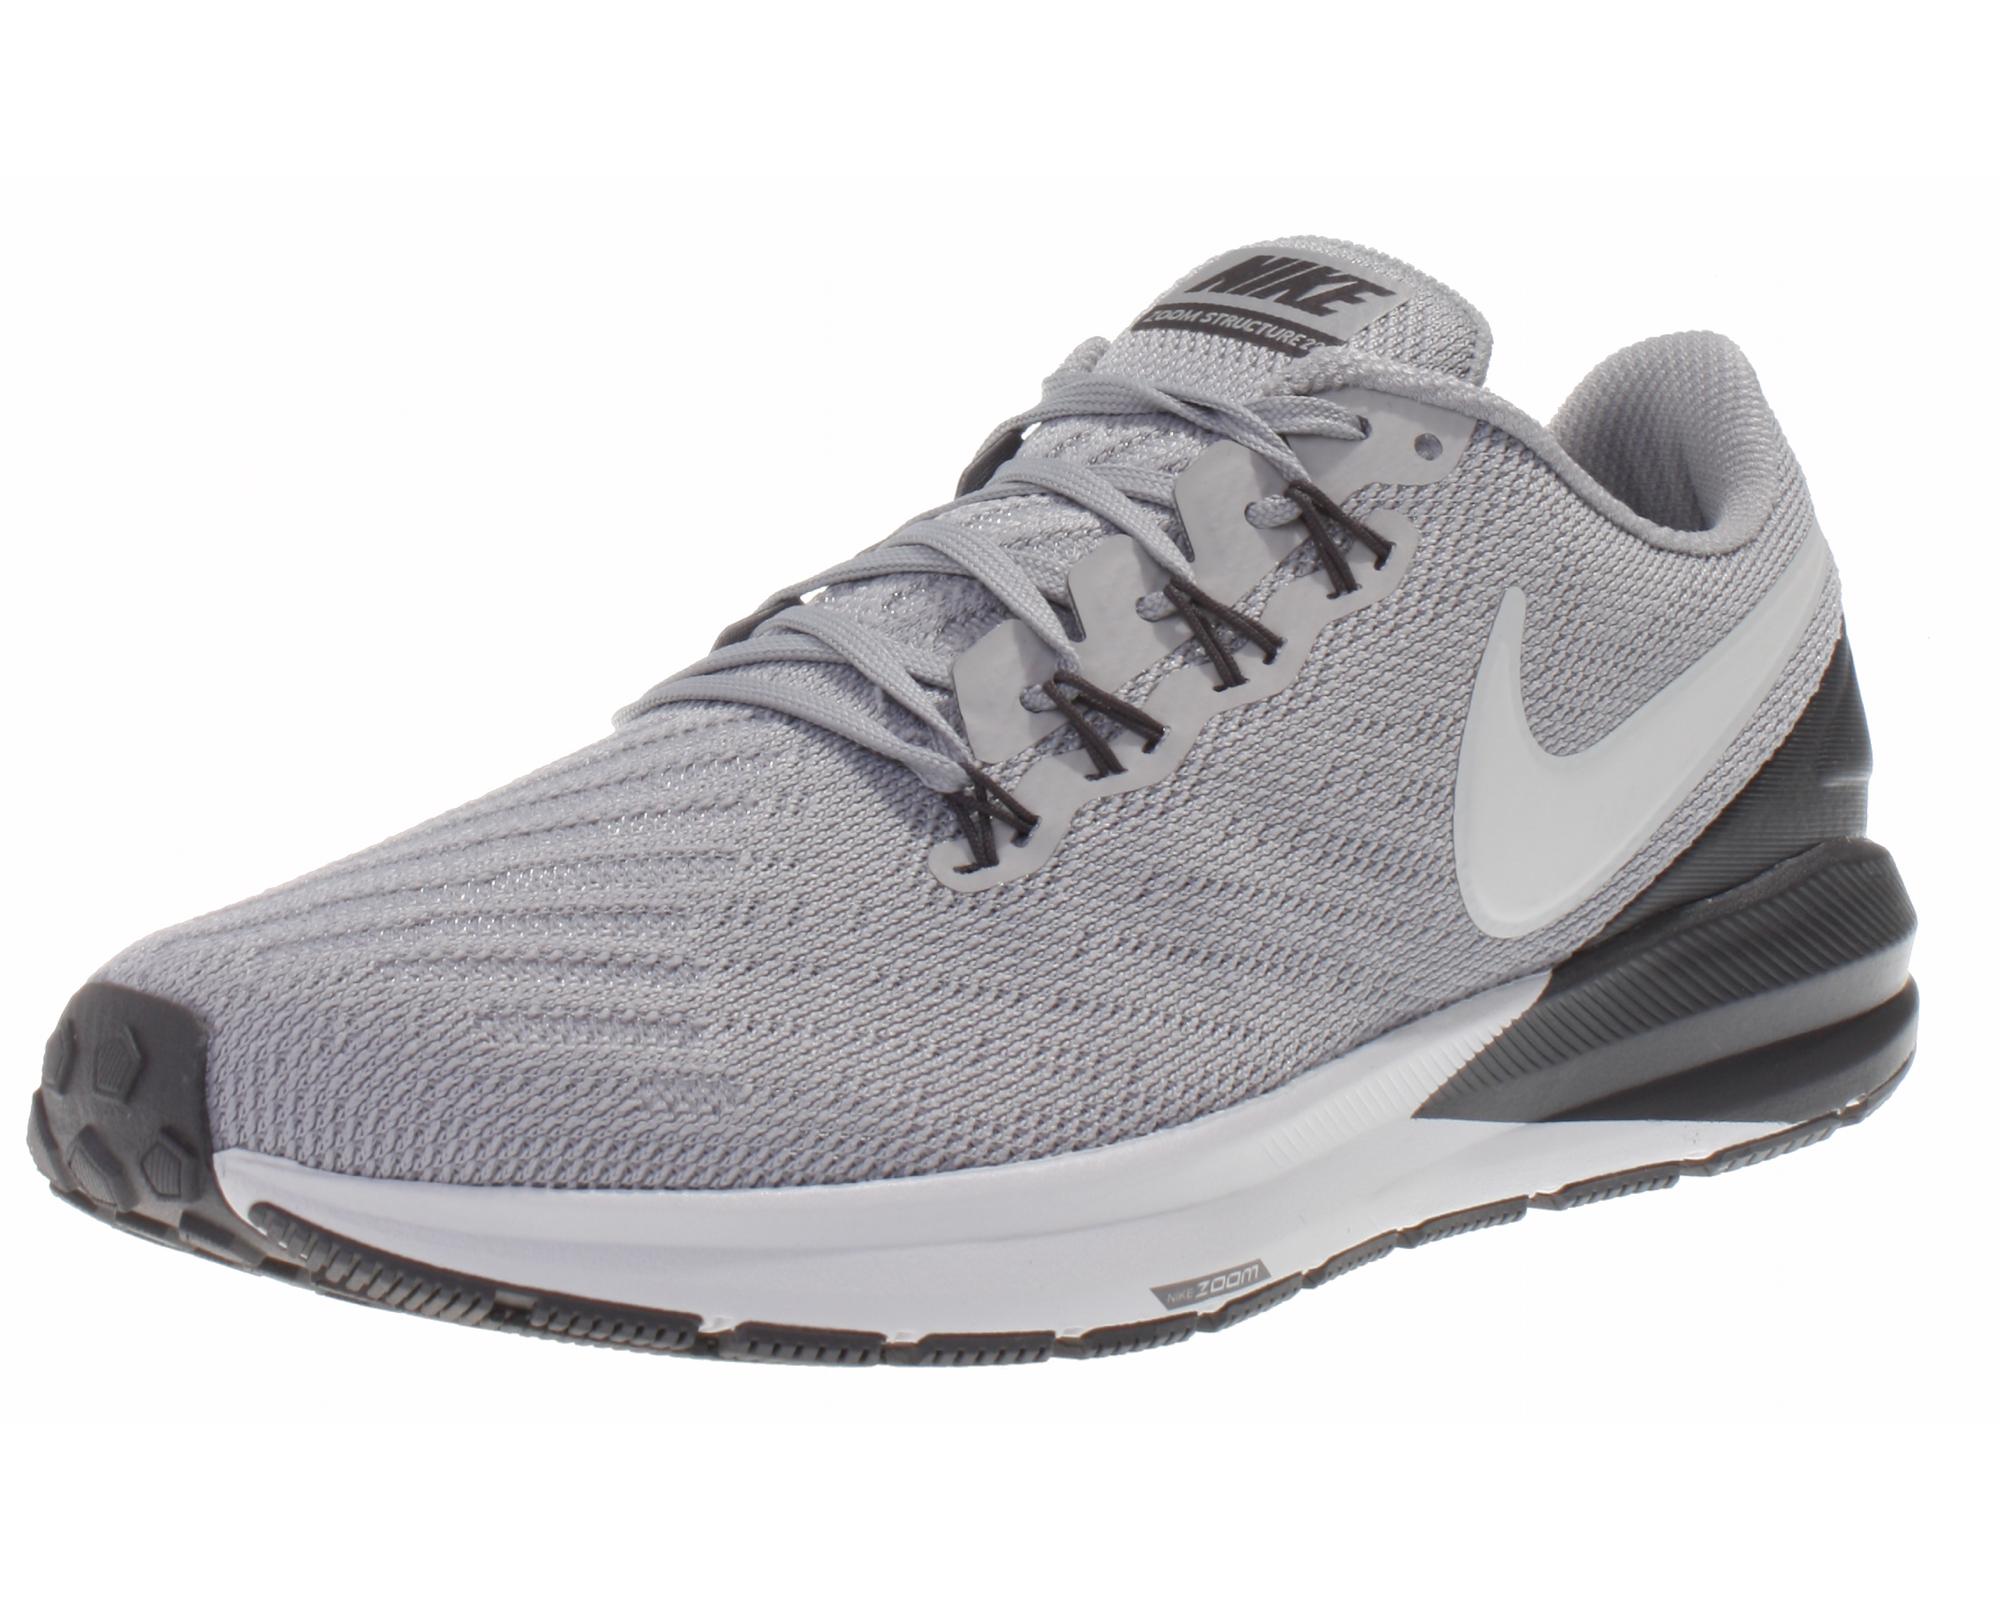 Nike Herren Schuhe in Grau | Stylight